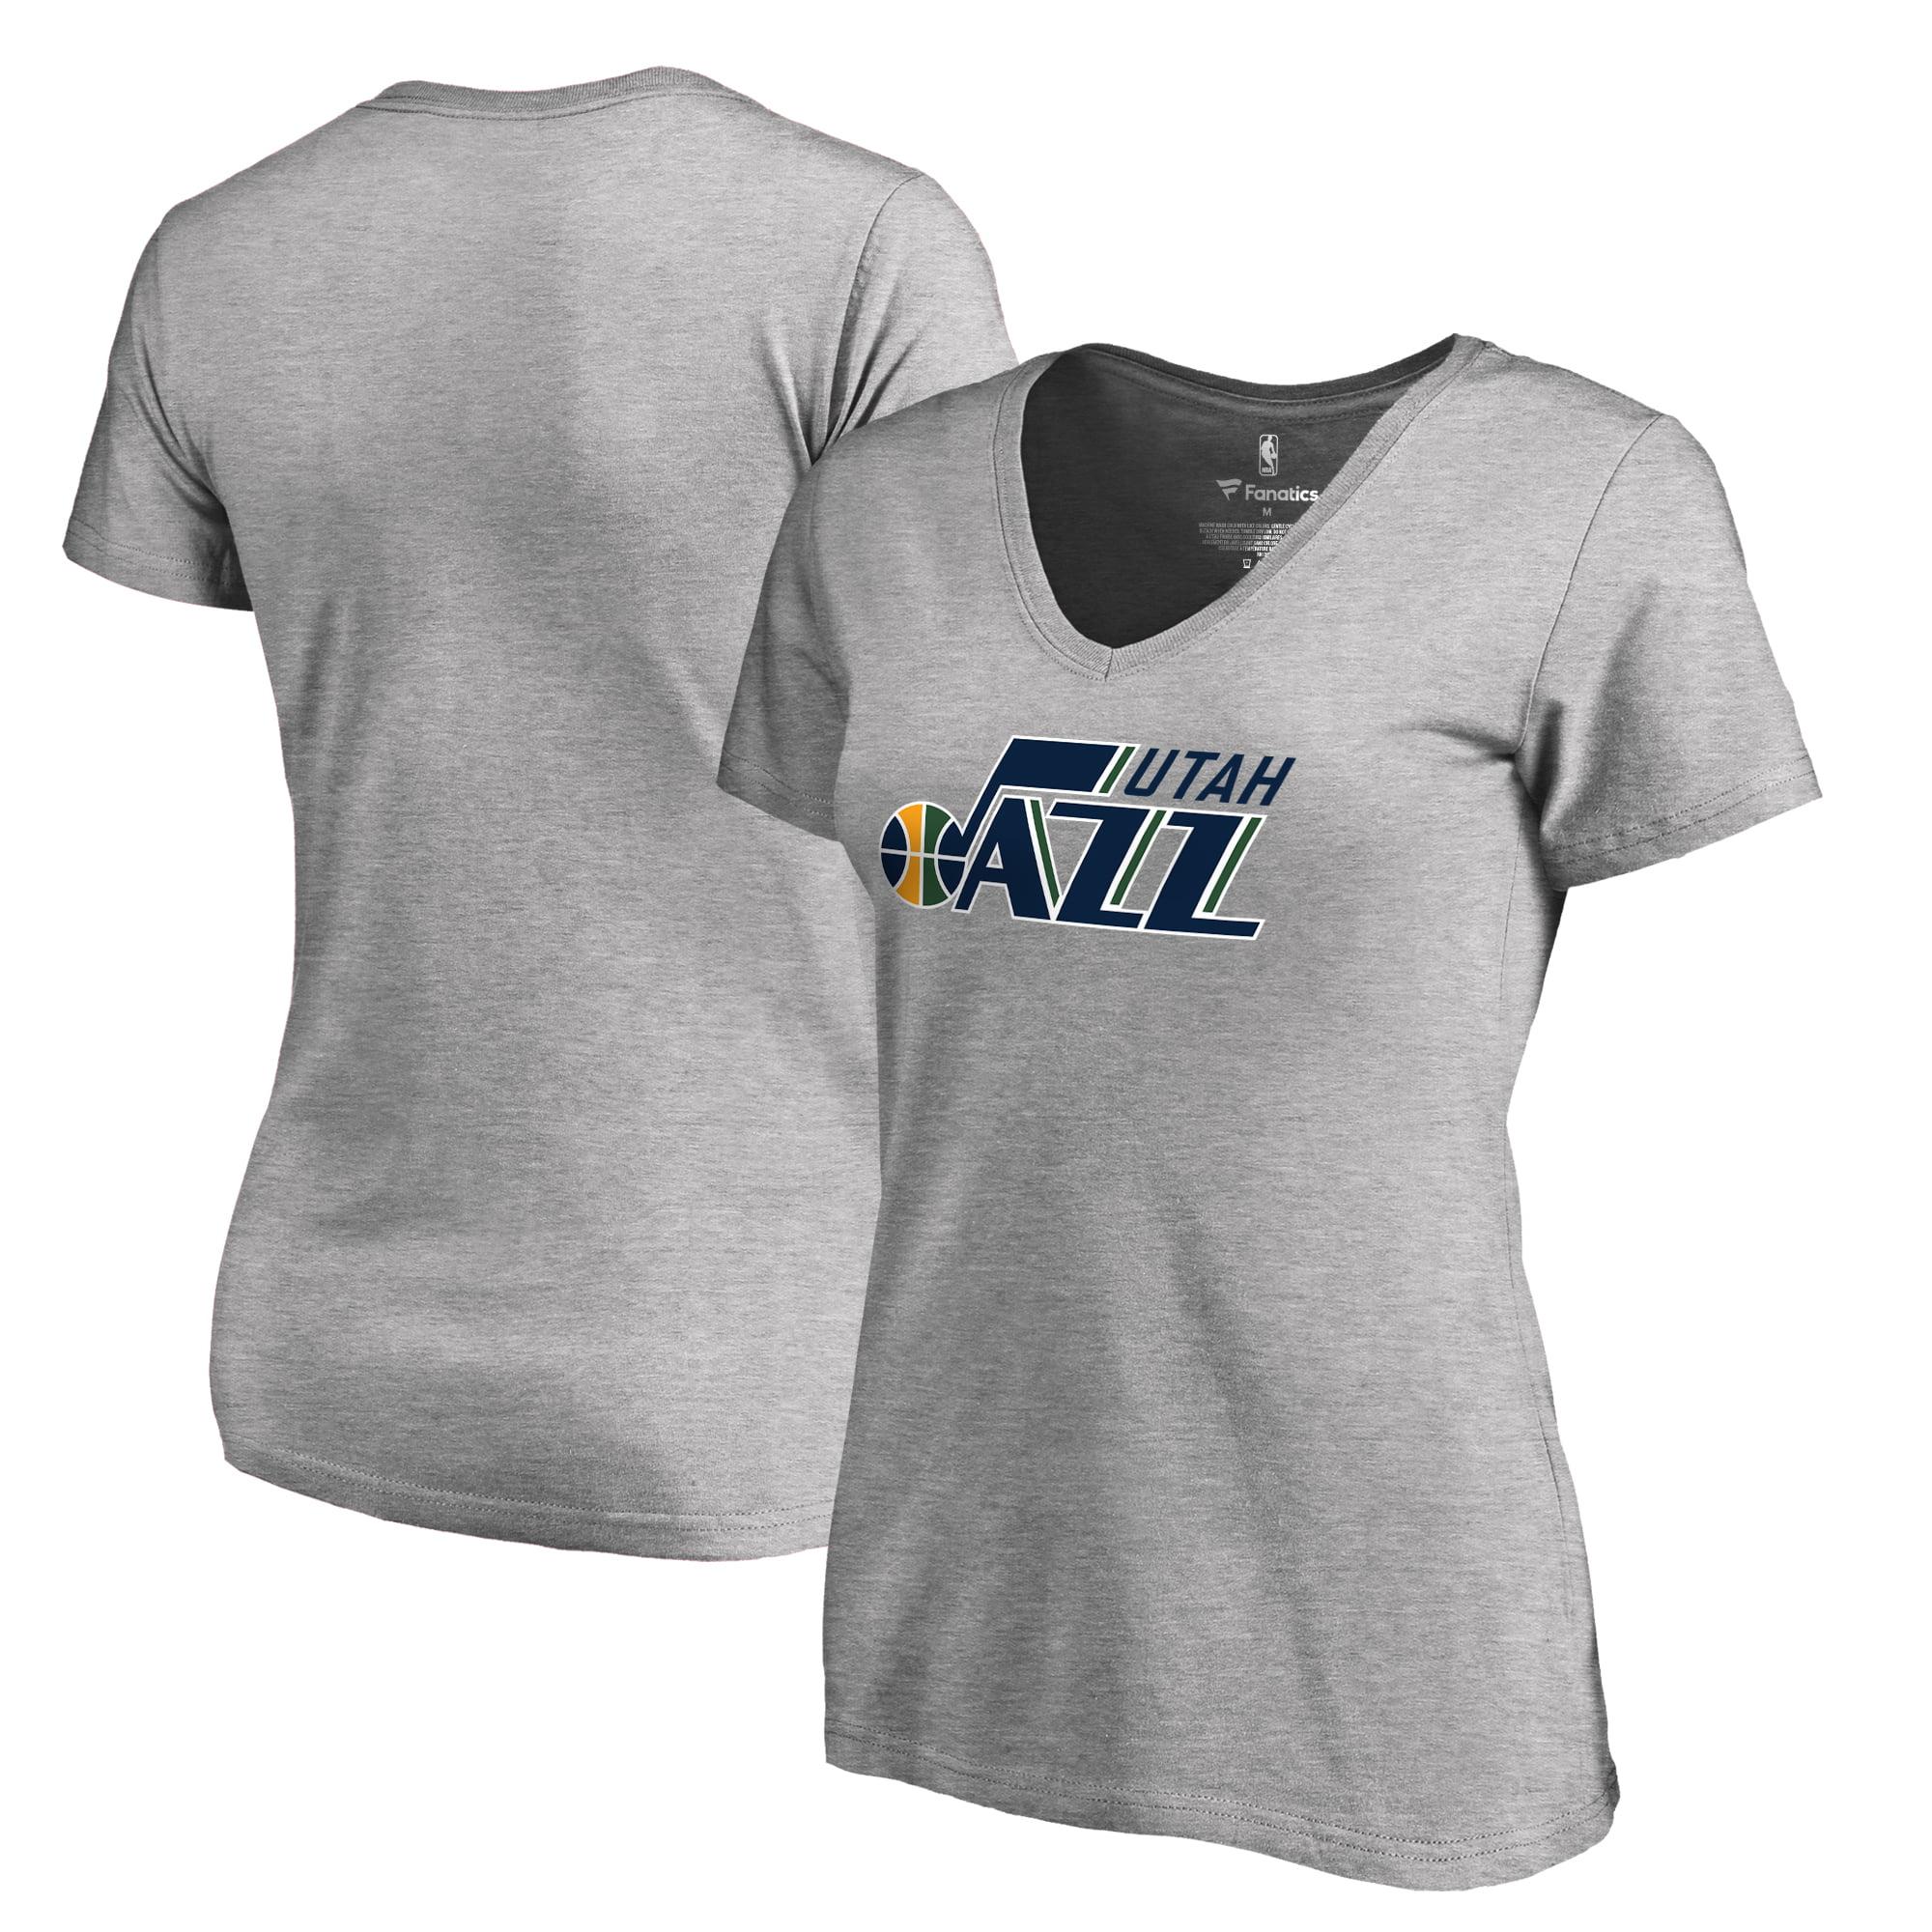 Utah Jazz Fanatics Branded Women's Plus Sizes Team Primary Logo T-Shirt - Ash